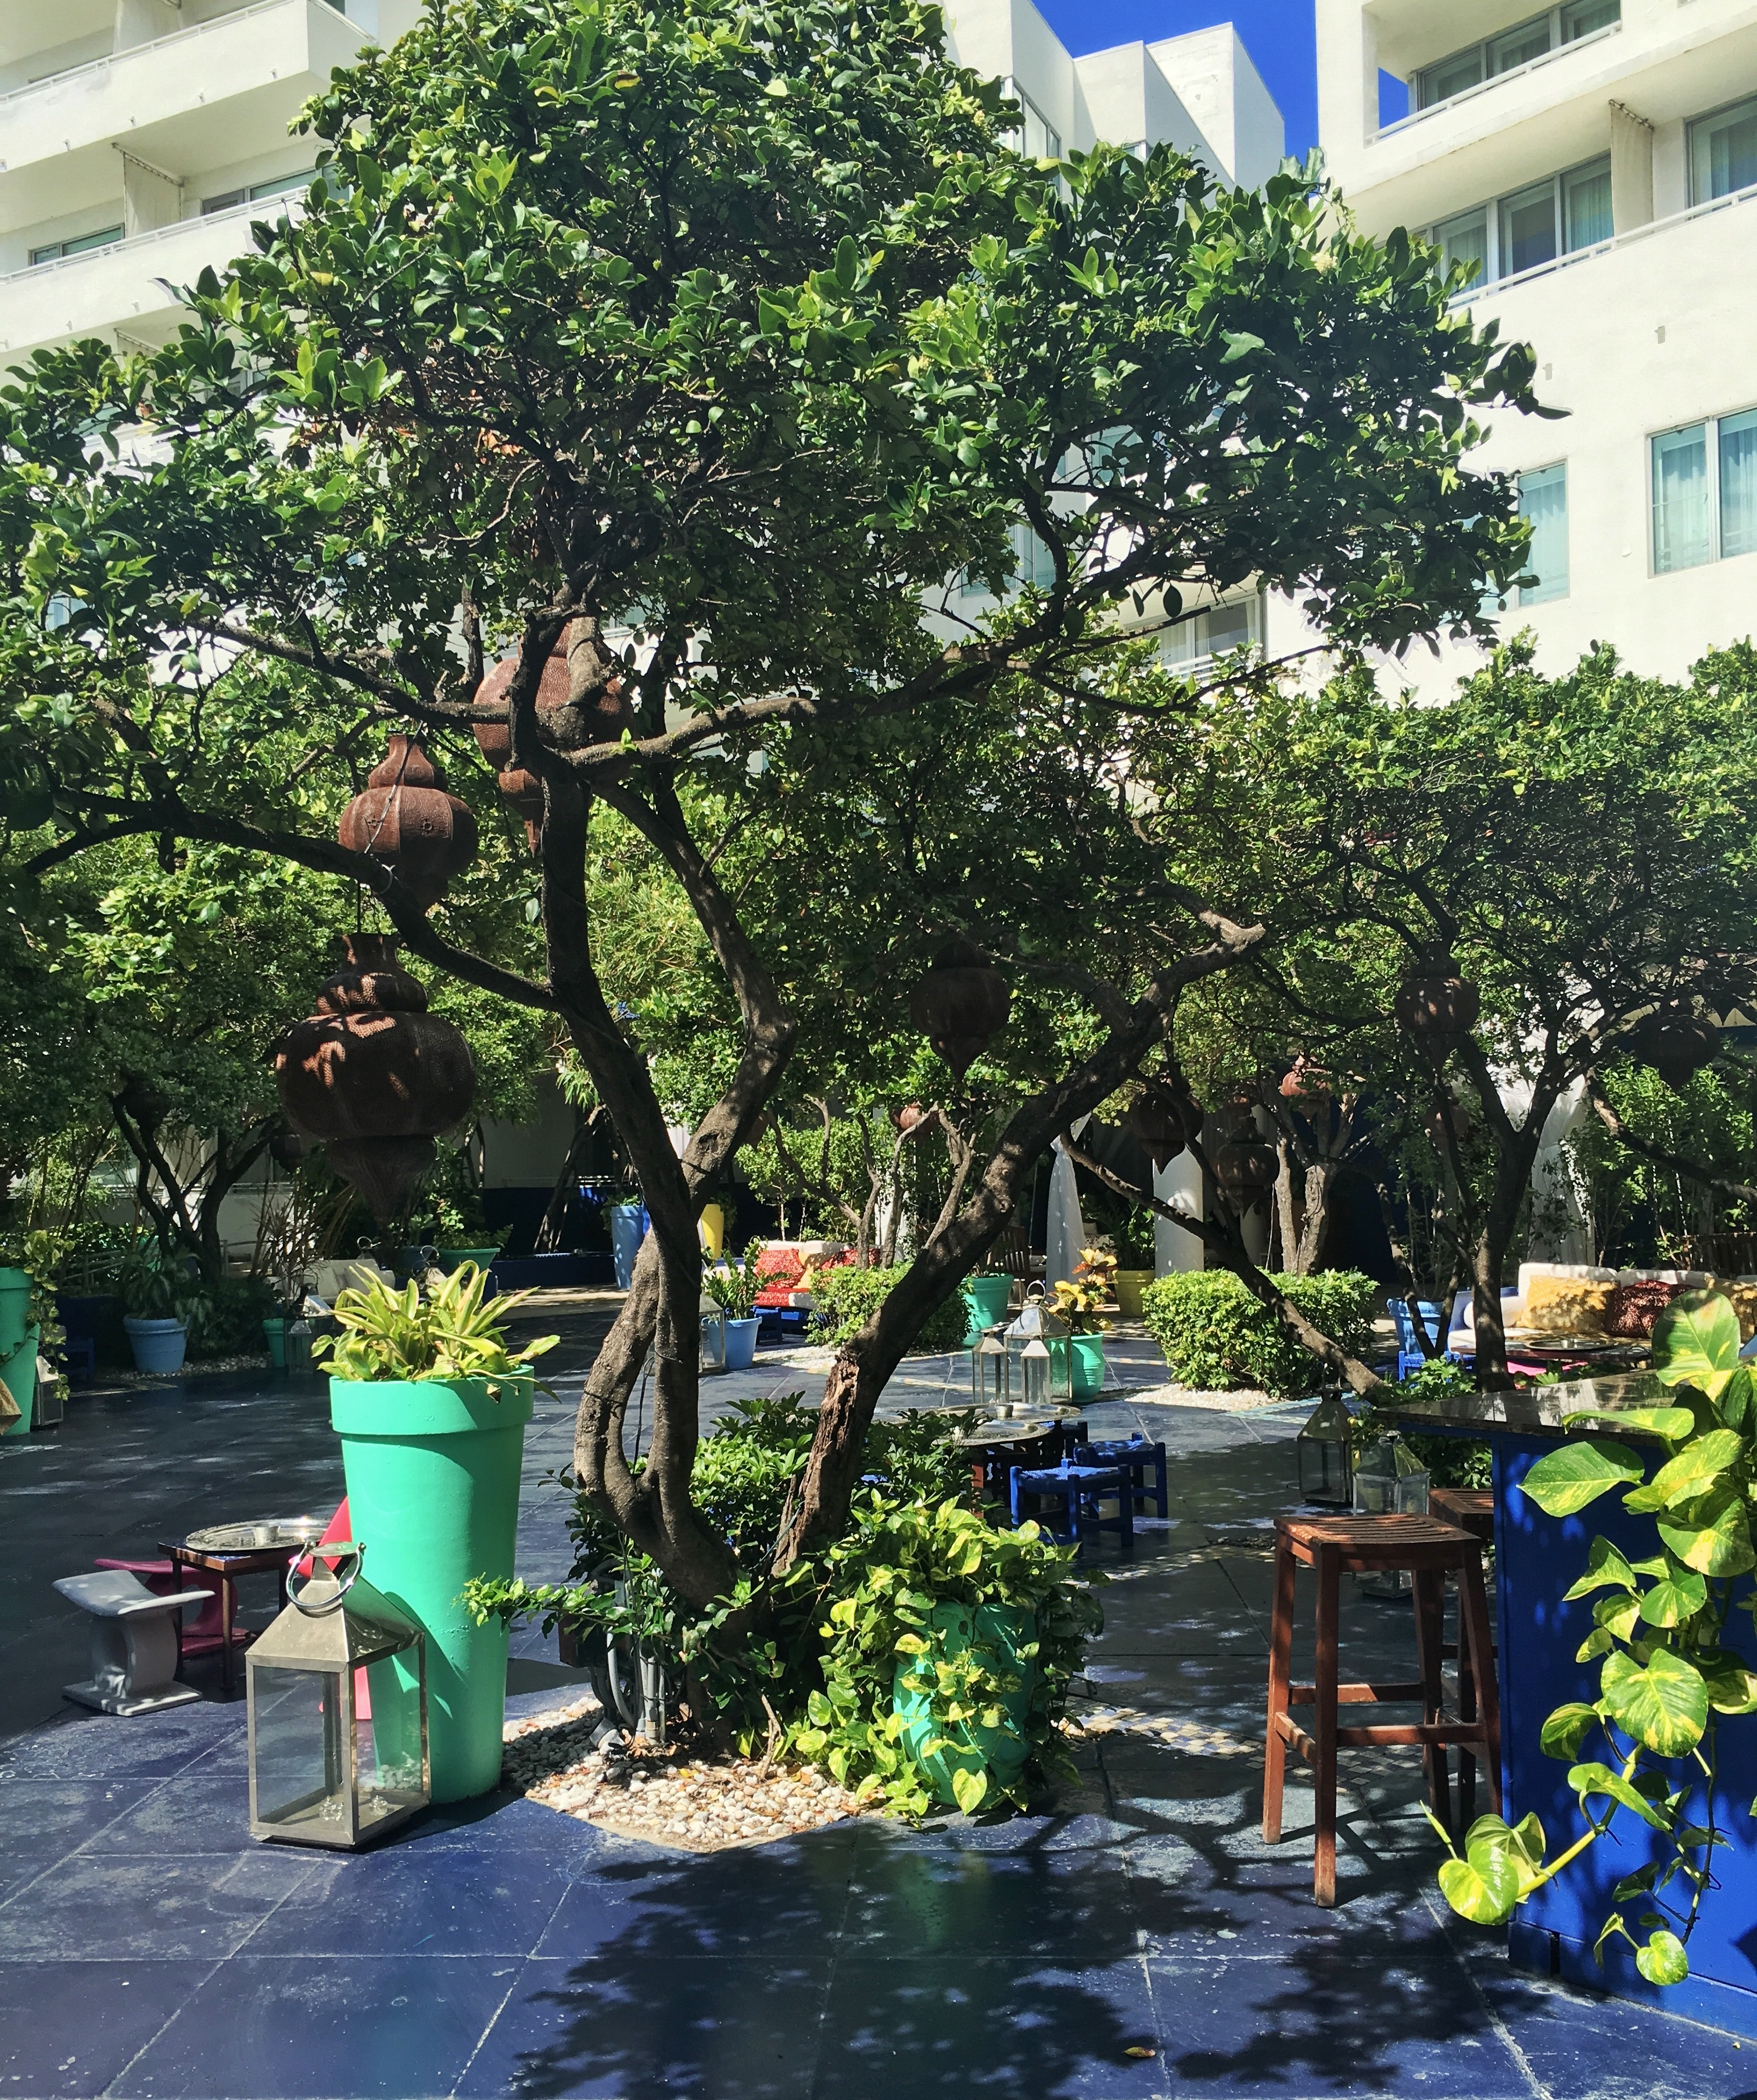 Outdoor decor at Terraza at The Shore Club Hotel in South Beach, Miami.